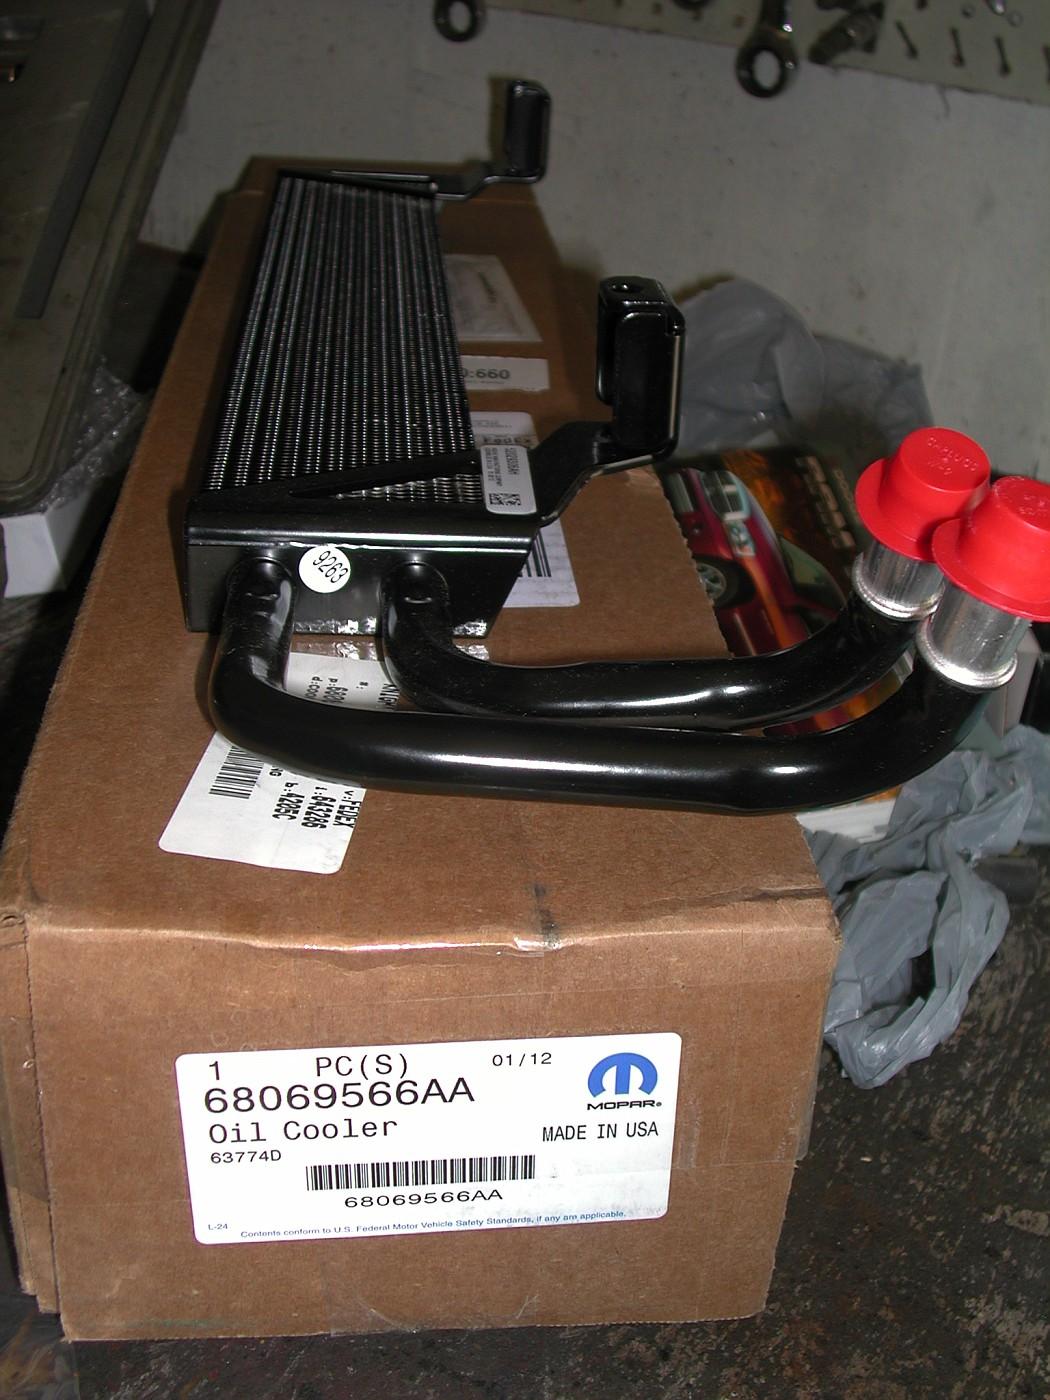 2007 Ram 1500 Power steering leak fix (PIC'S) - DodgeForum com